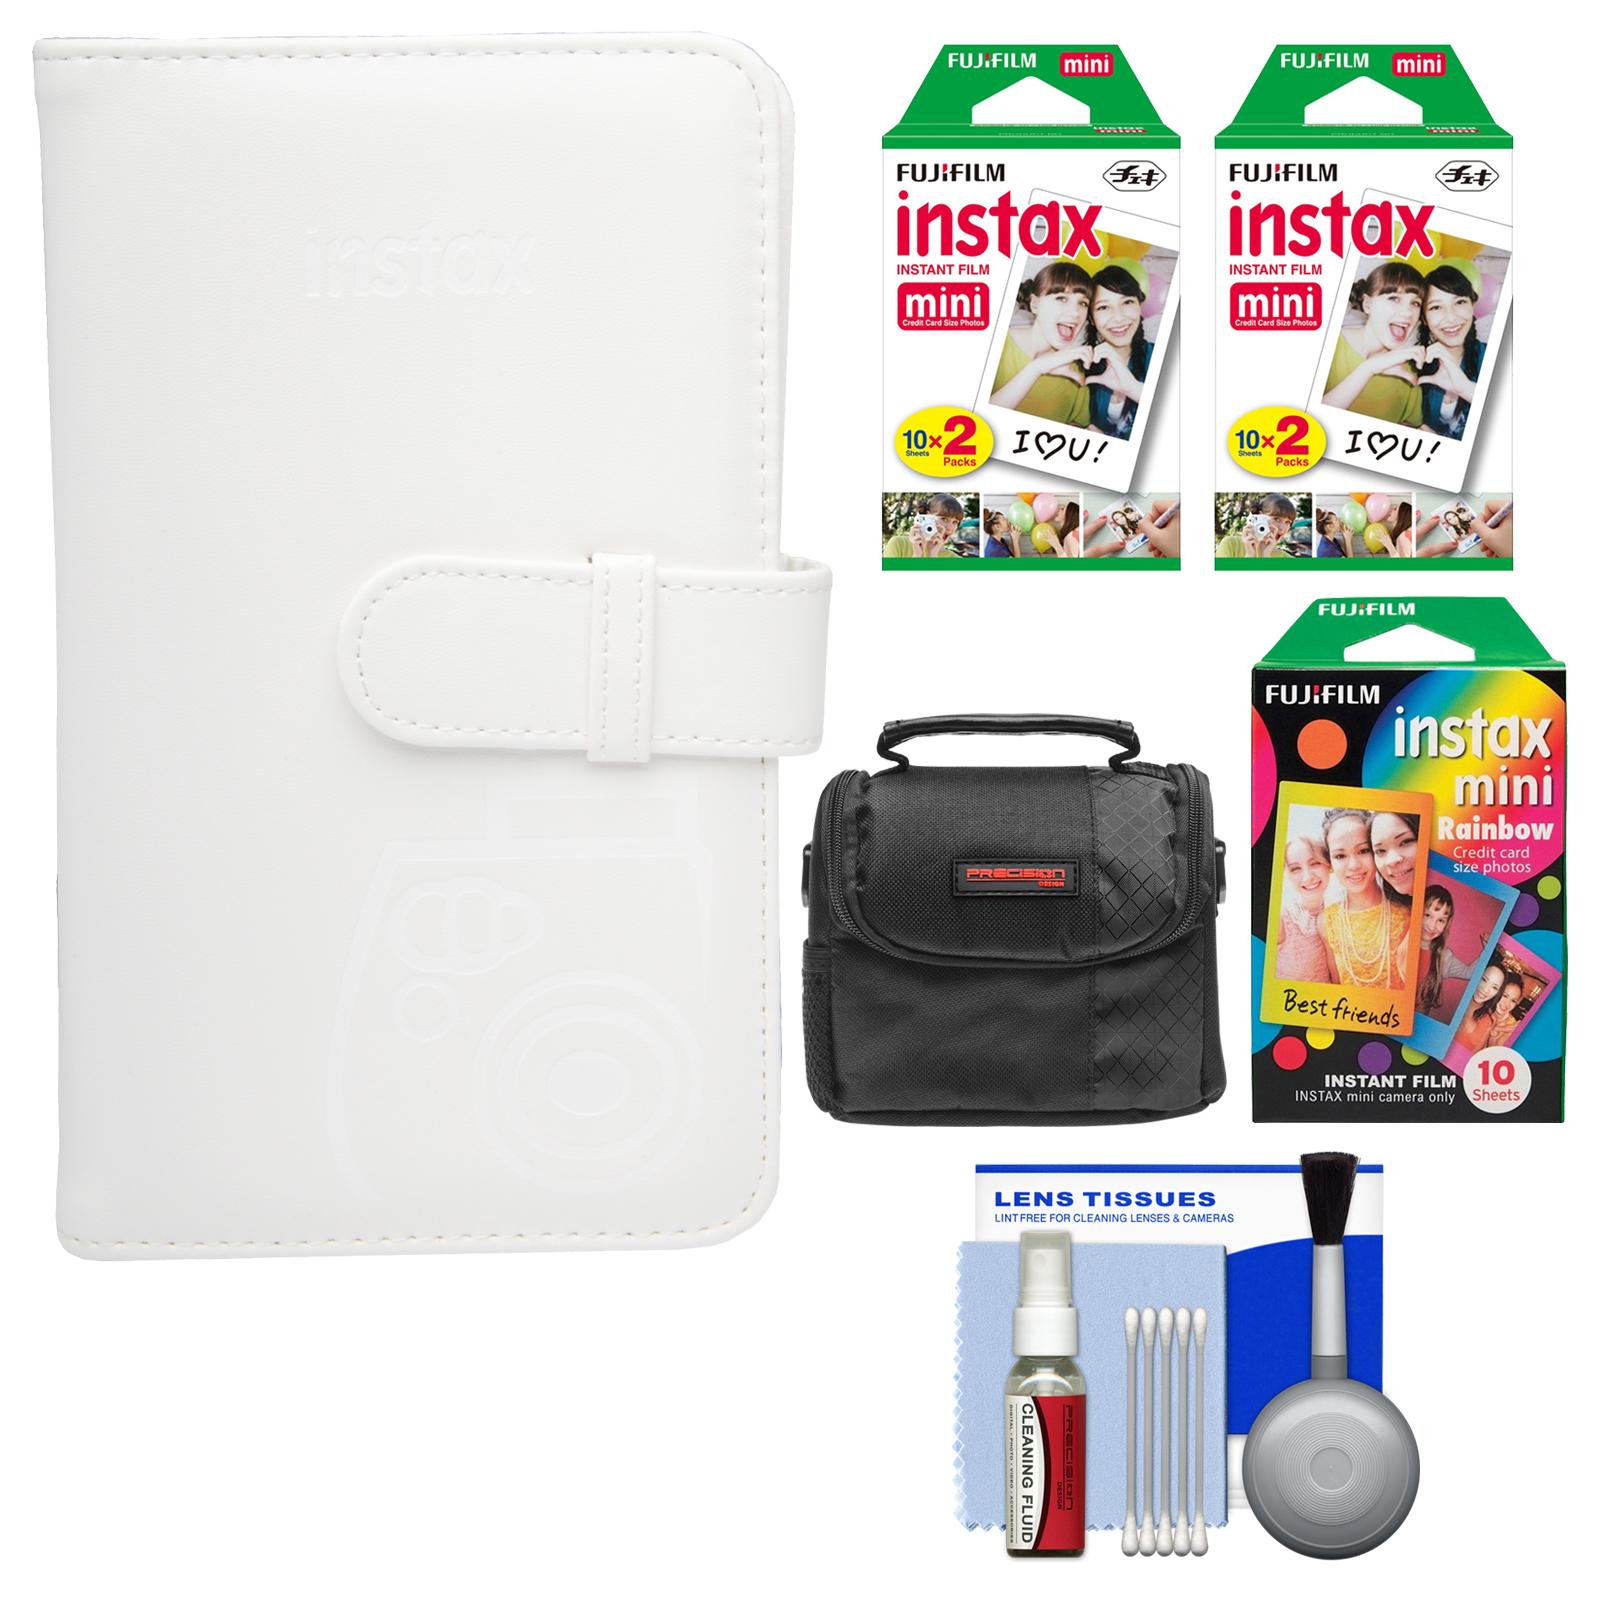 FujiFilm Instax Mini Wallet 108 Photo Album (White) with 40 Color Prints & 10 Rainbow Prints + Case + Kit for... by Fujifilm